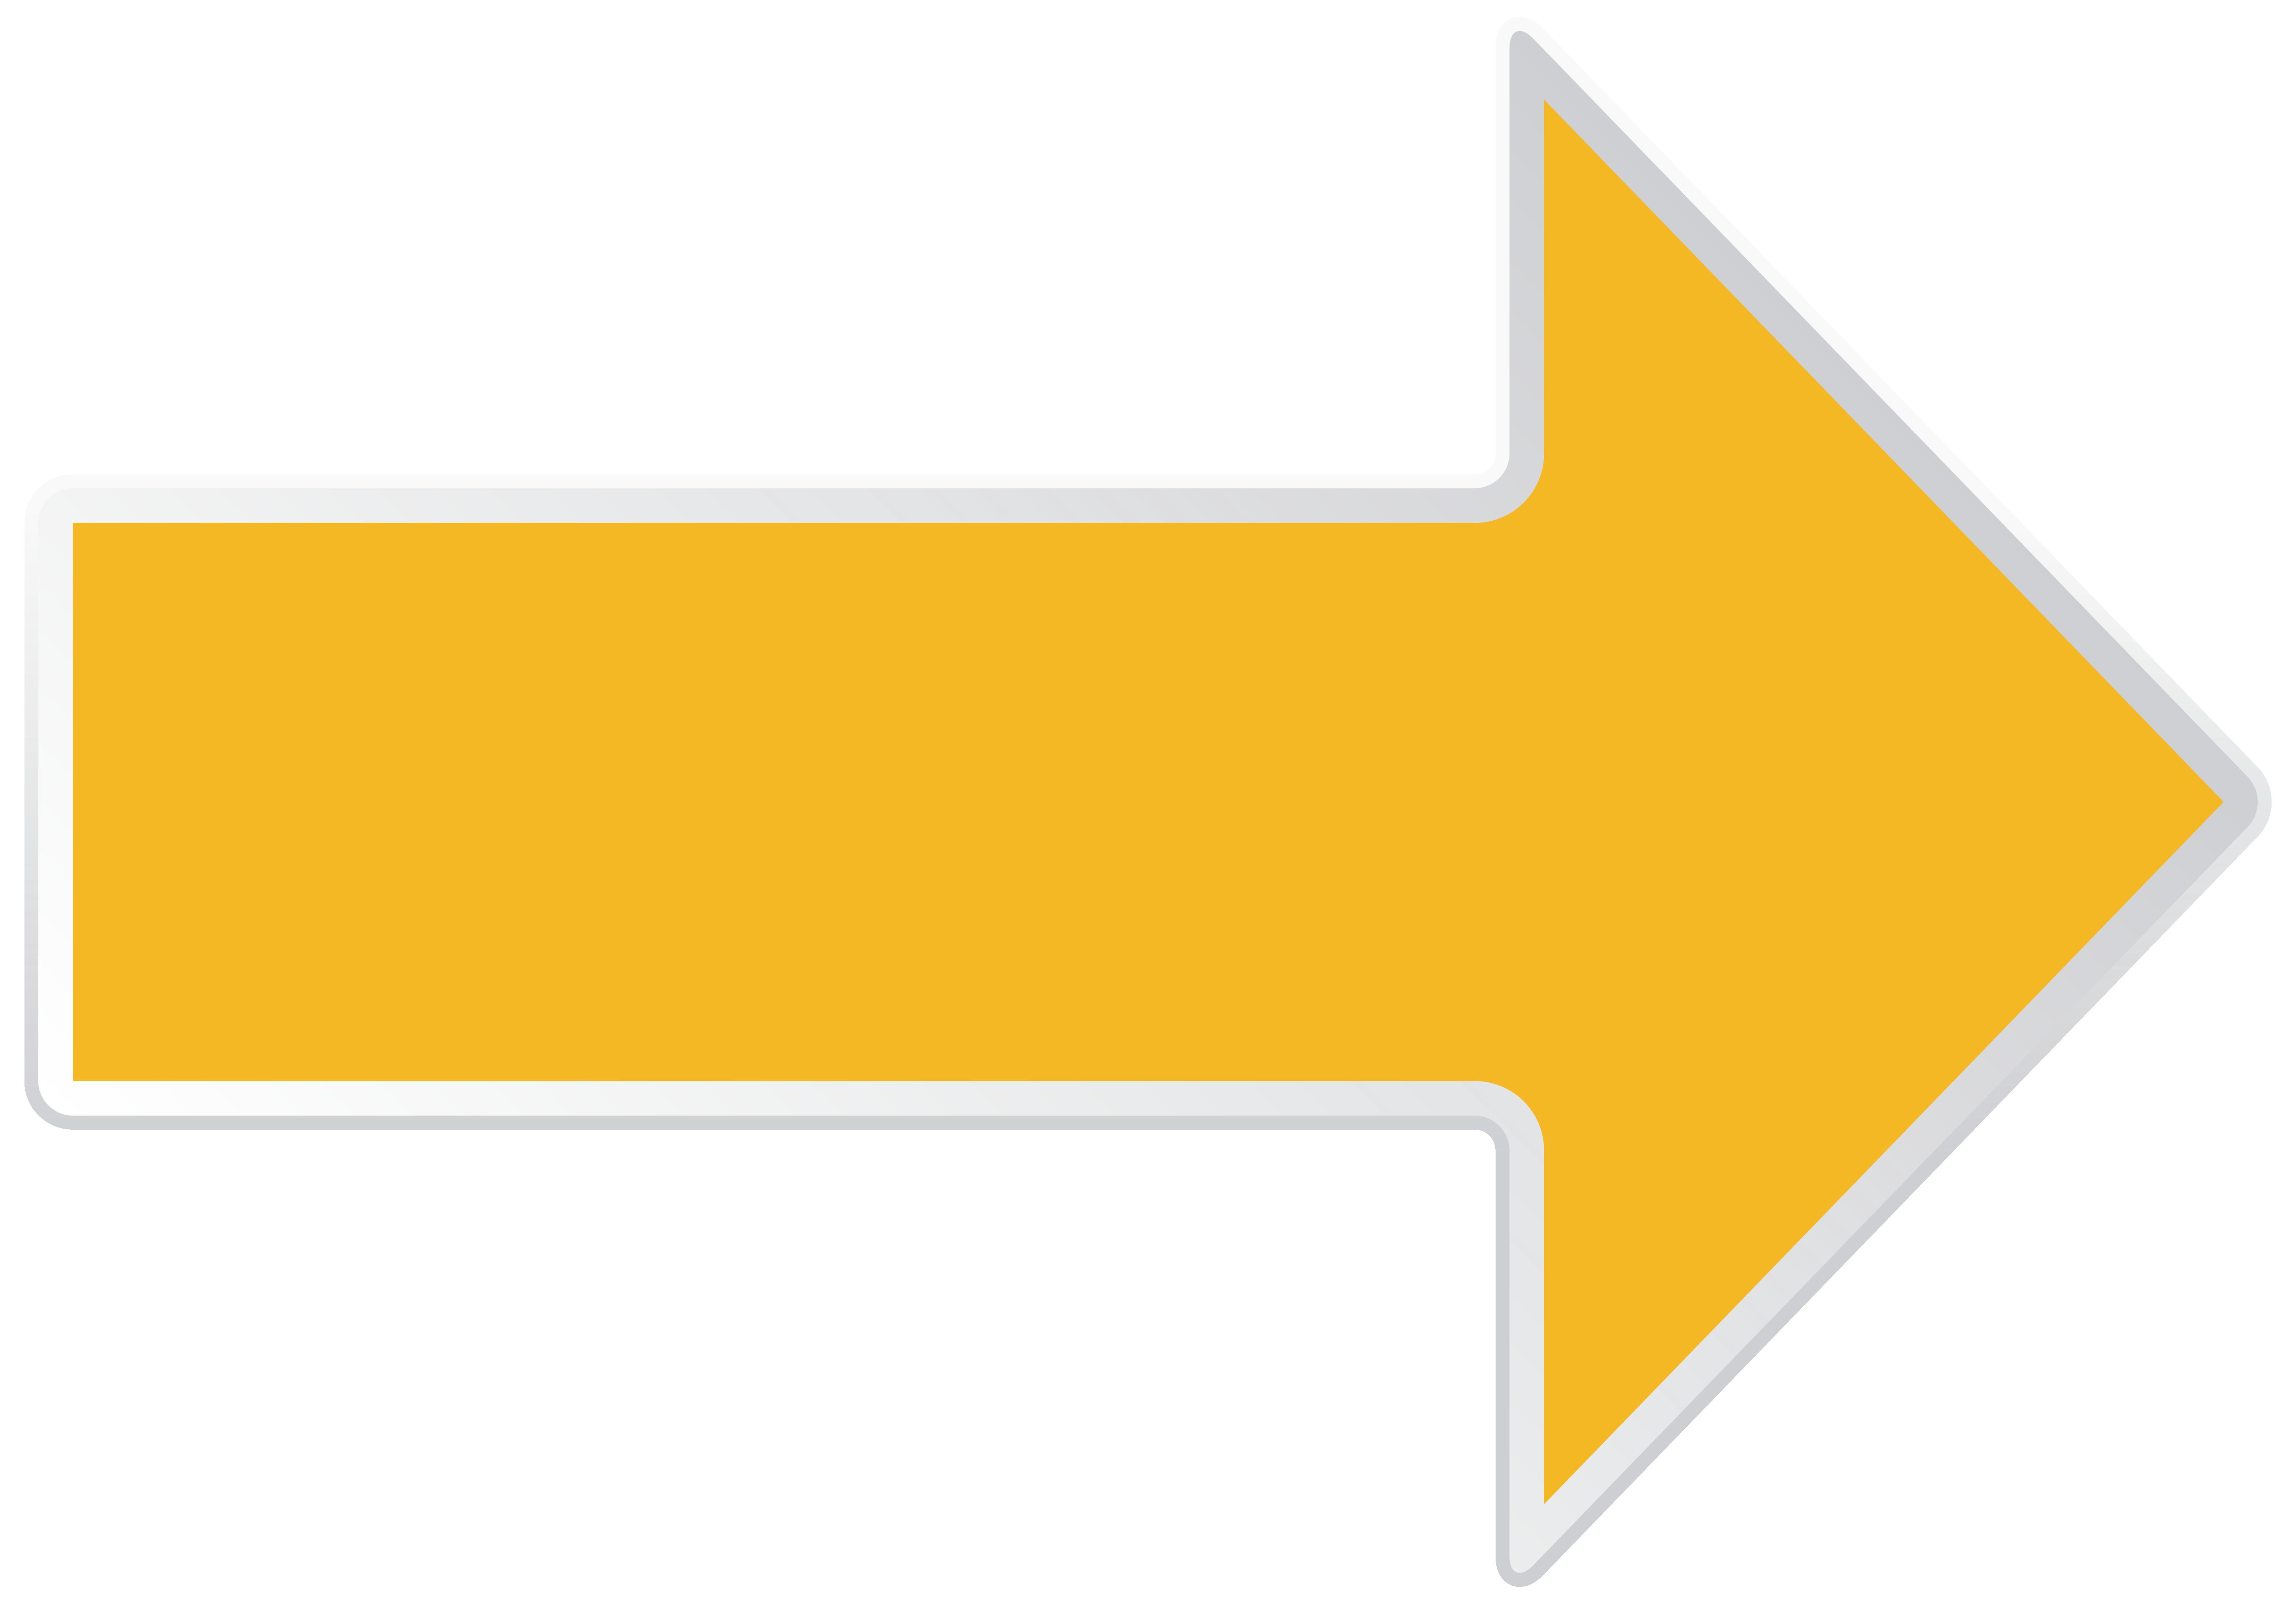 Arrow Yellow Right Transparent PNG Clip Art Image